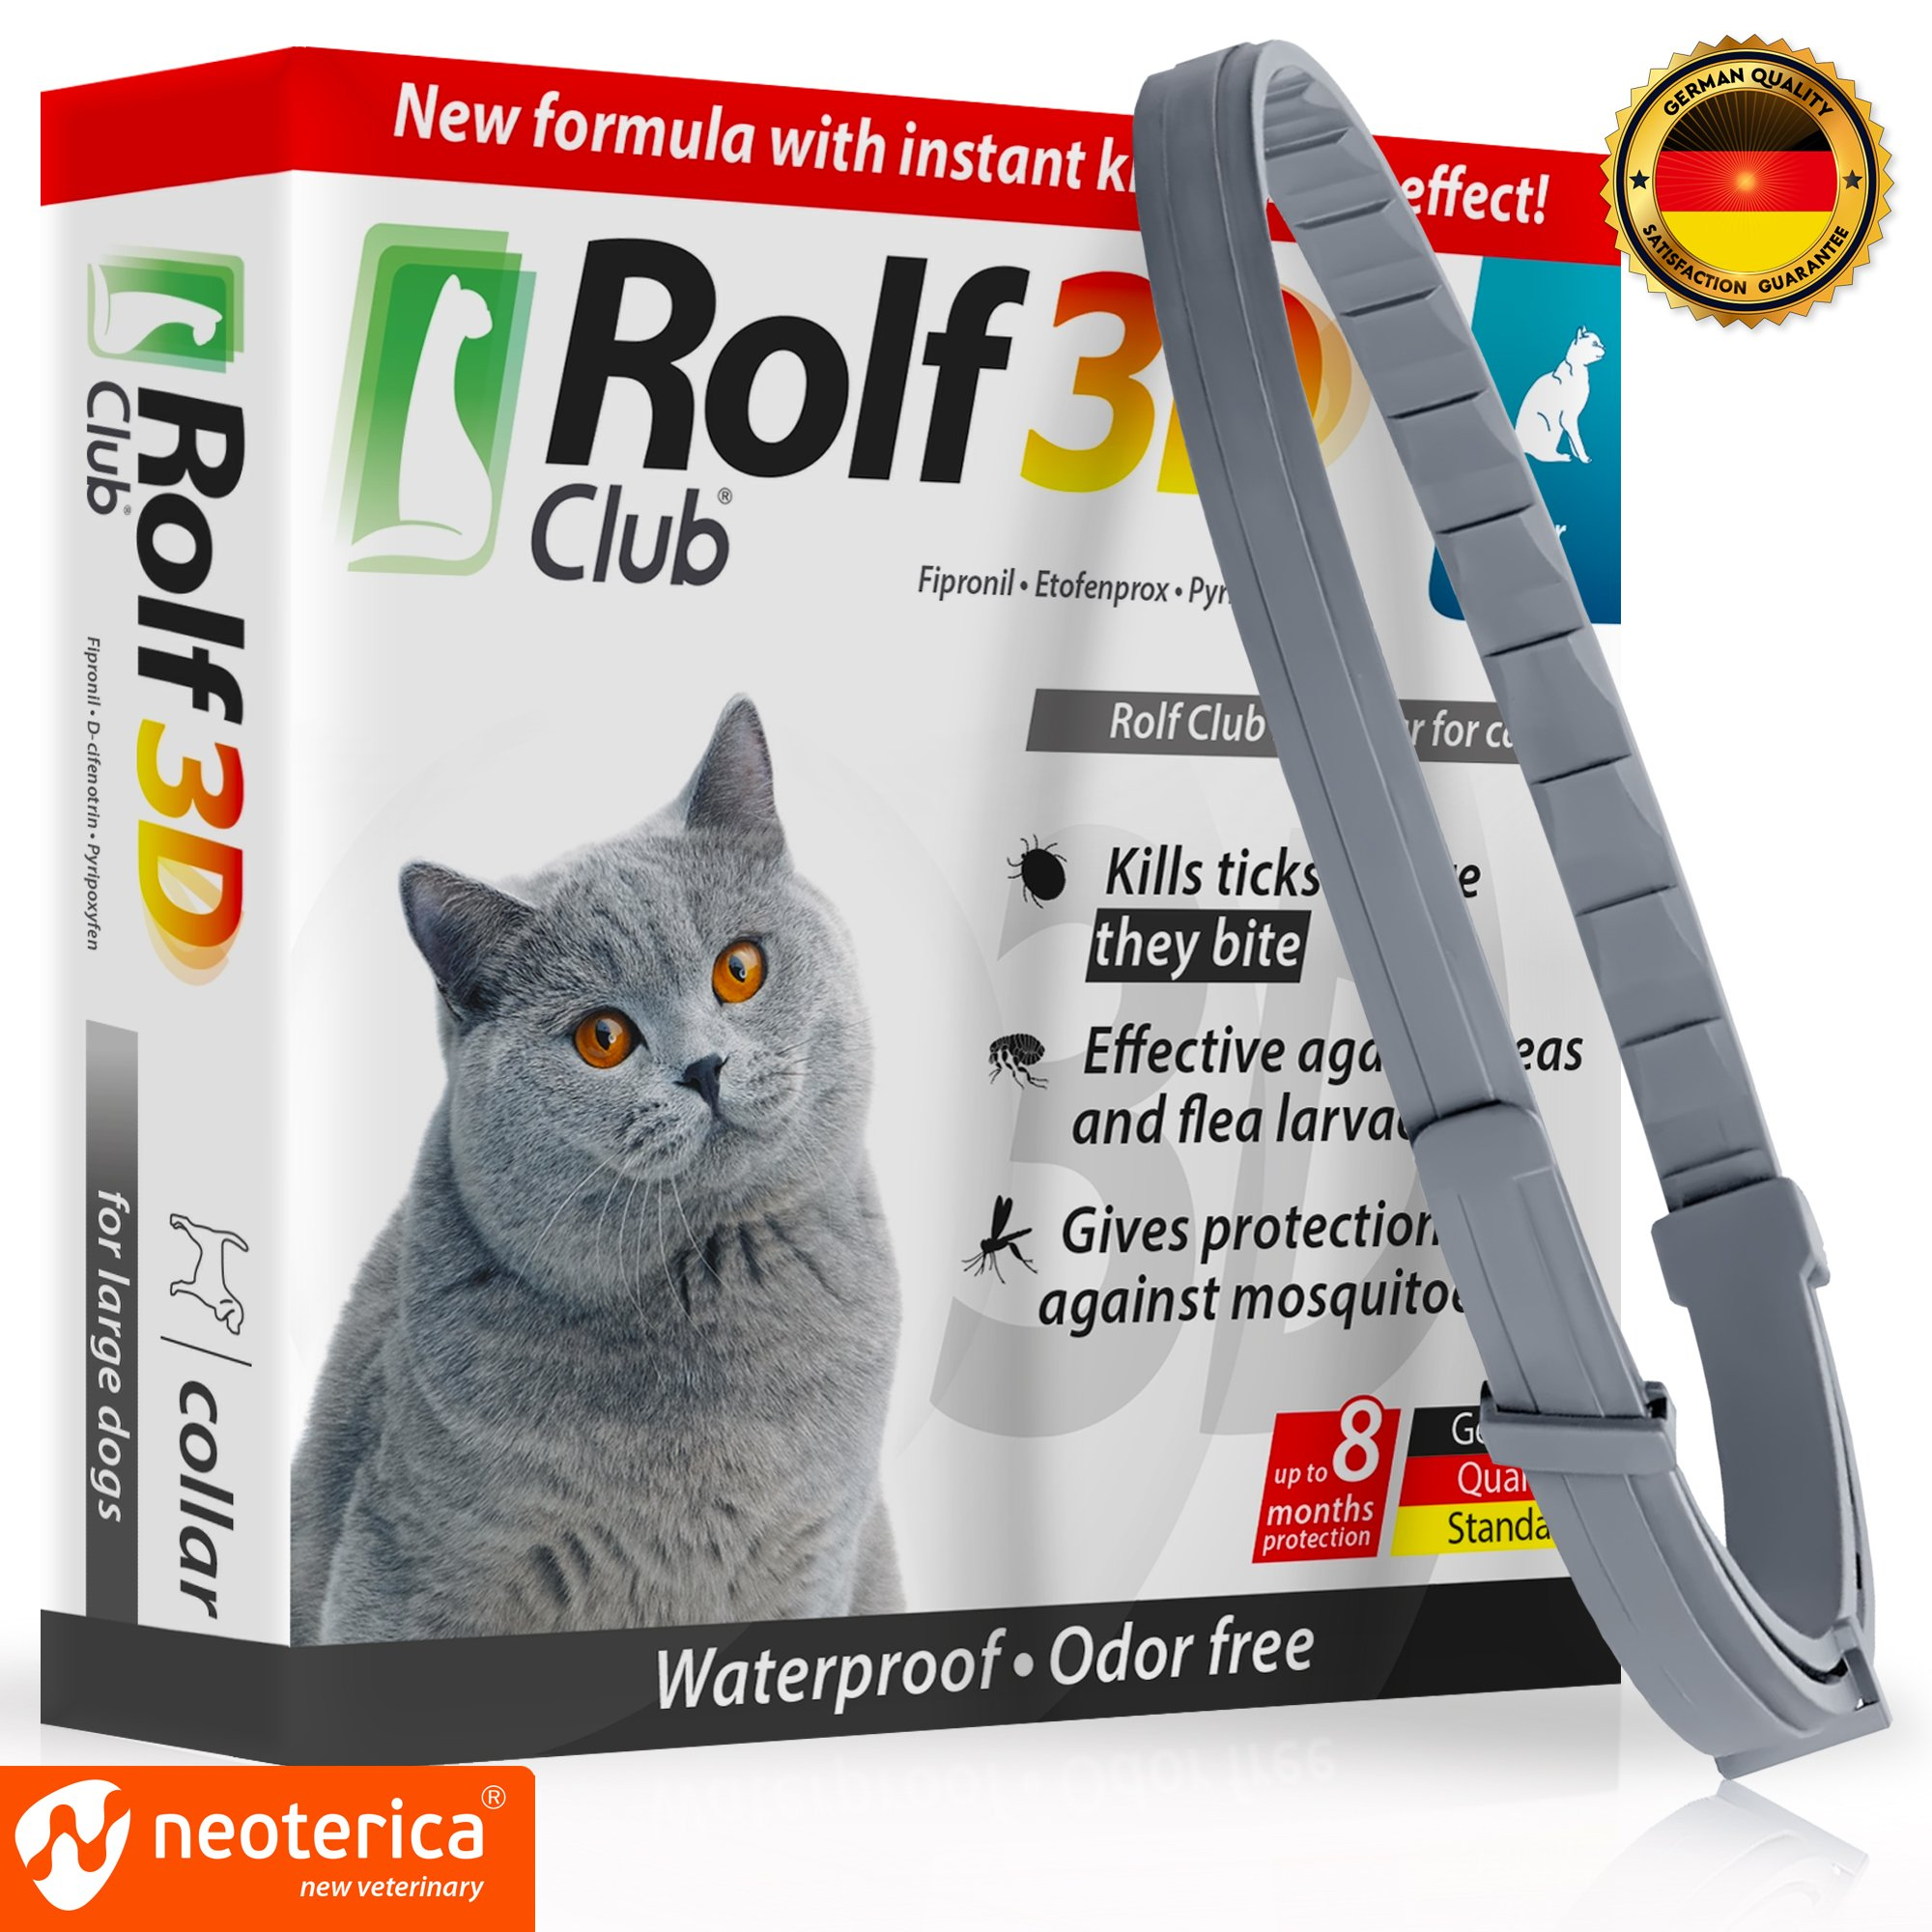 Rolf Club 3D FLEA Collar for Cats - Flea and Tick Prevention for Cats - Cats Flea and Tick Control for 8 Months - SAFE Tick Repellent - WATERPROOF Tick Treatment (for Cats)